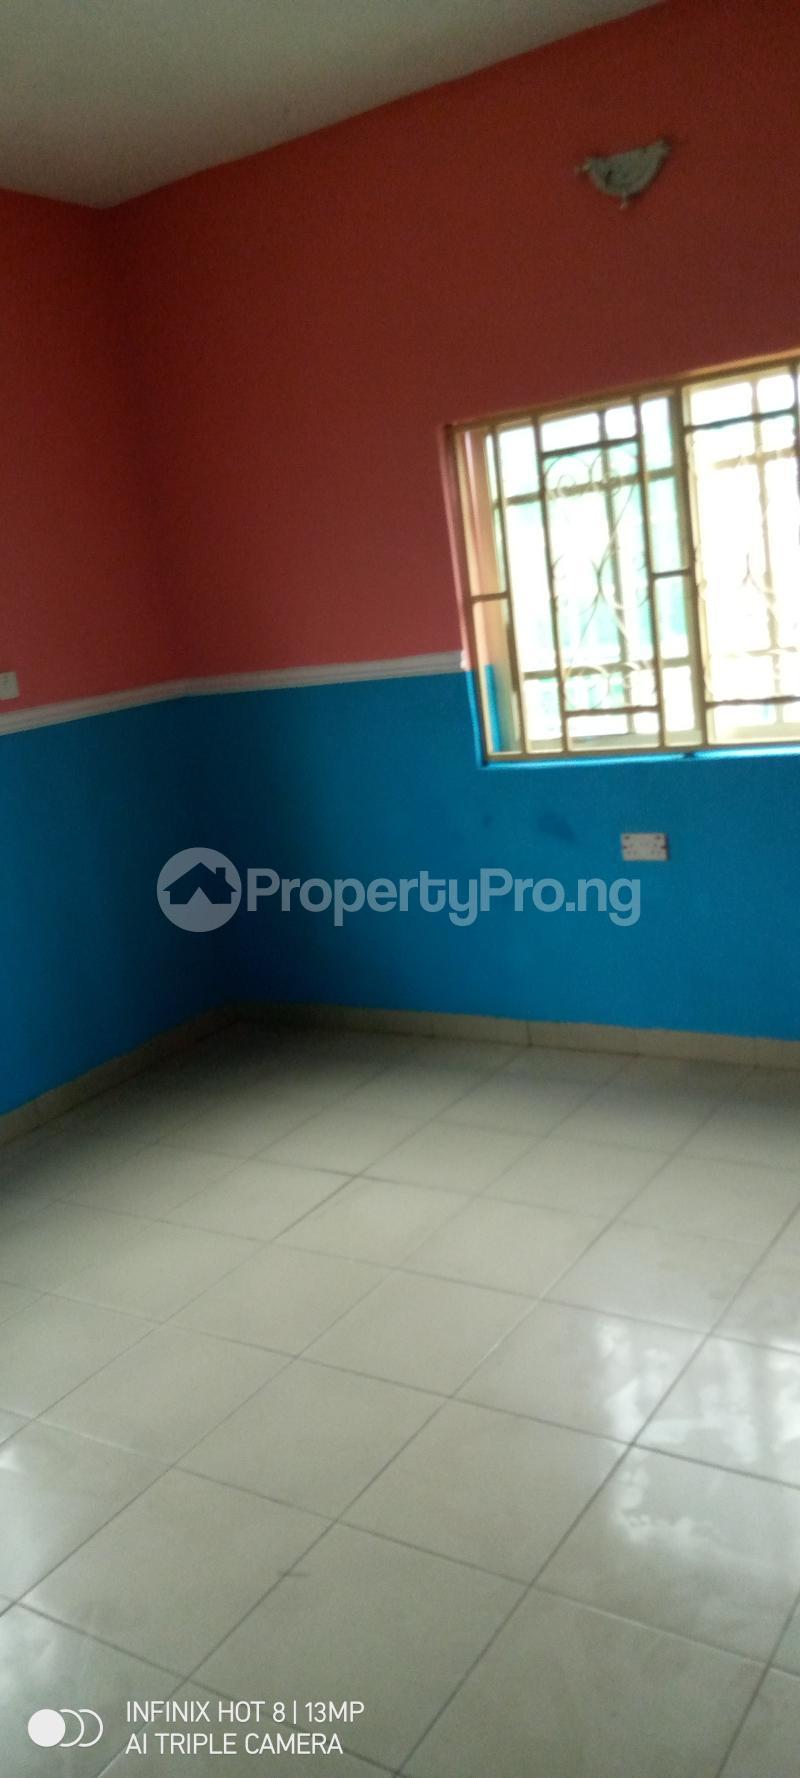 3 bedroom Flat / Apartment for rent Green field estate Amuwo Odofin Amuwo Odofin Lagos - 3